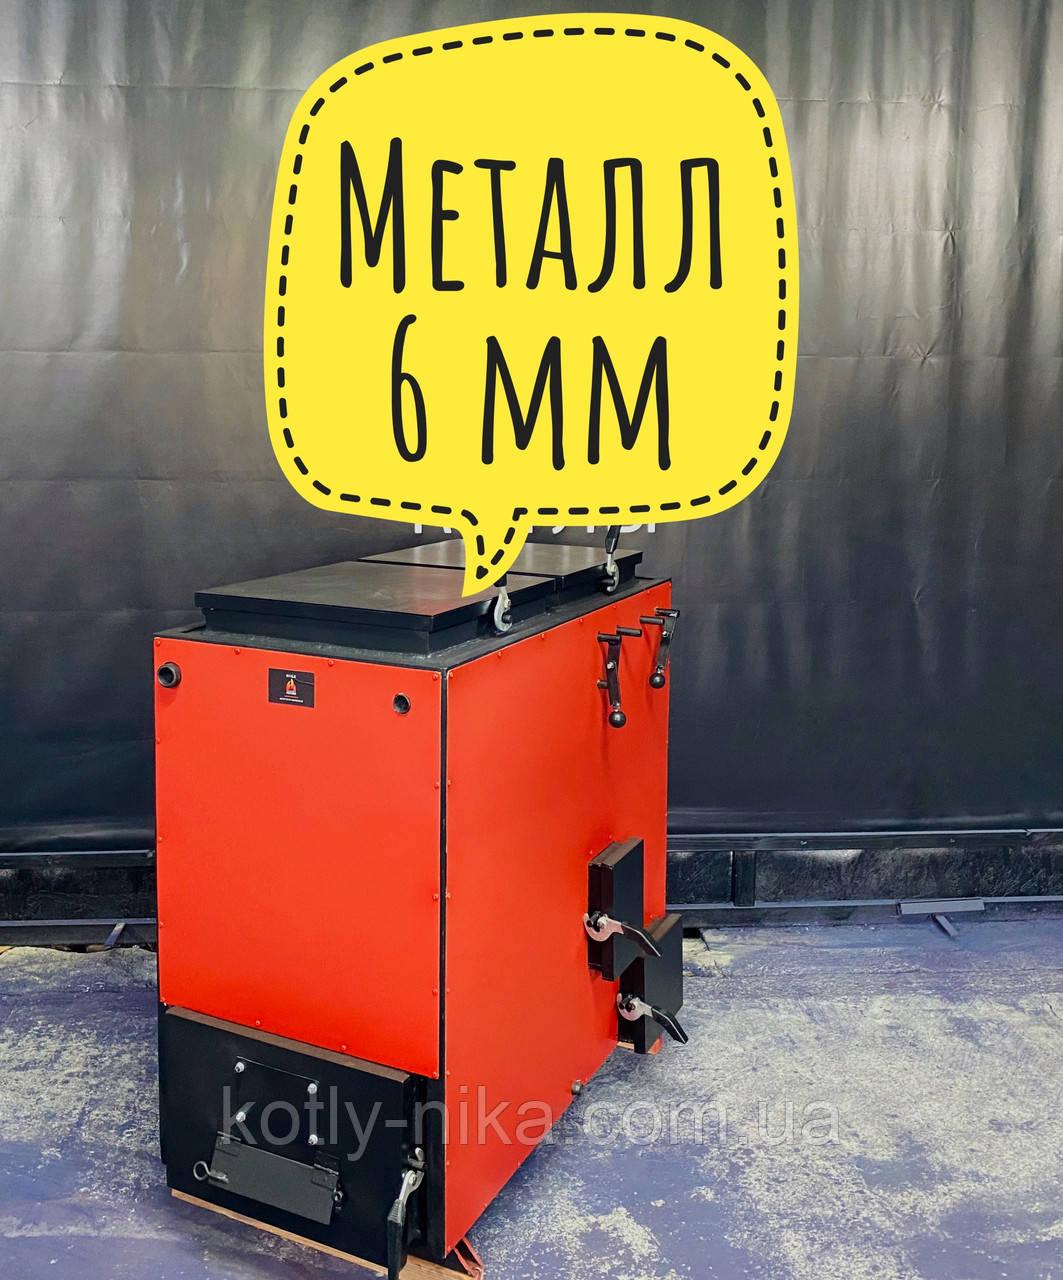 Котел Питон 30 кВт с регулировкой мощности МЕТАЛЛ 6 мм